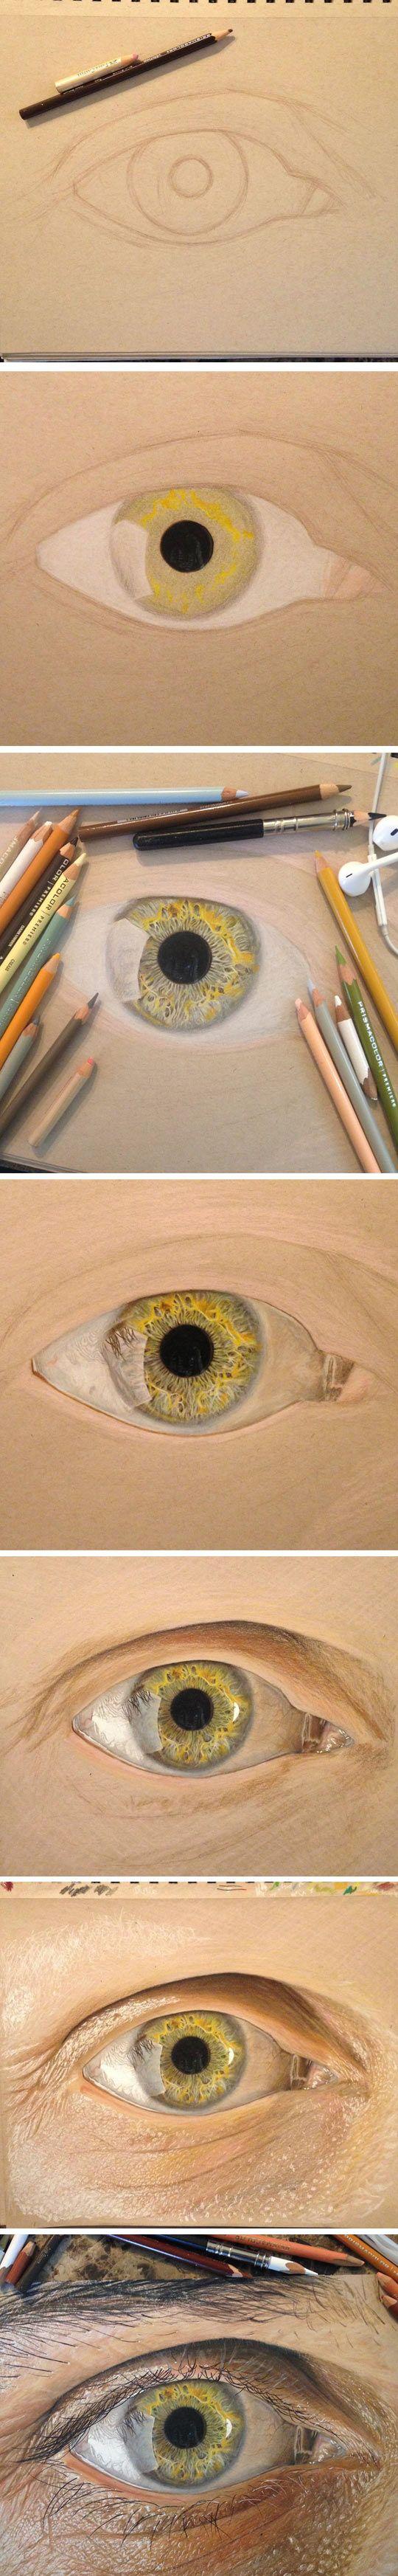 Not Just An Eye, Hiperrealist Eyes